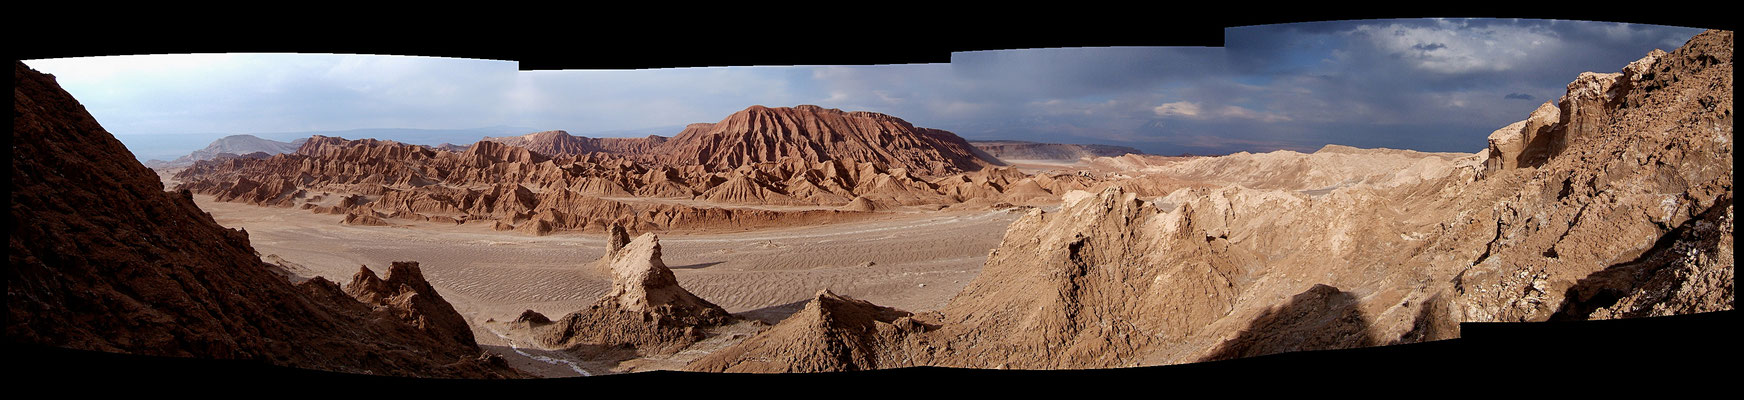 Panorama, Moon Valley, San Pedro ,Atacama, Chili, Chi,  .JPG